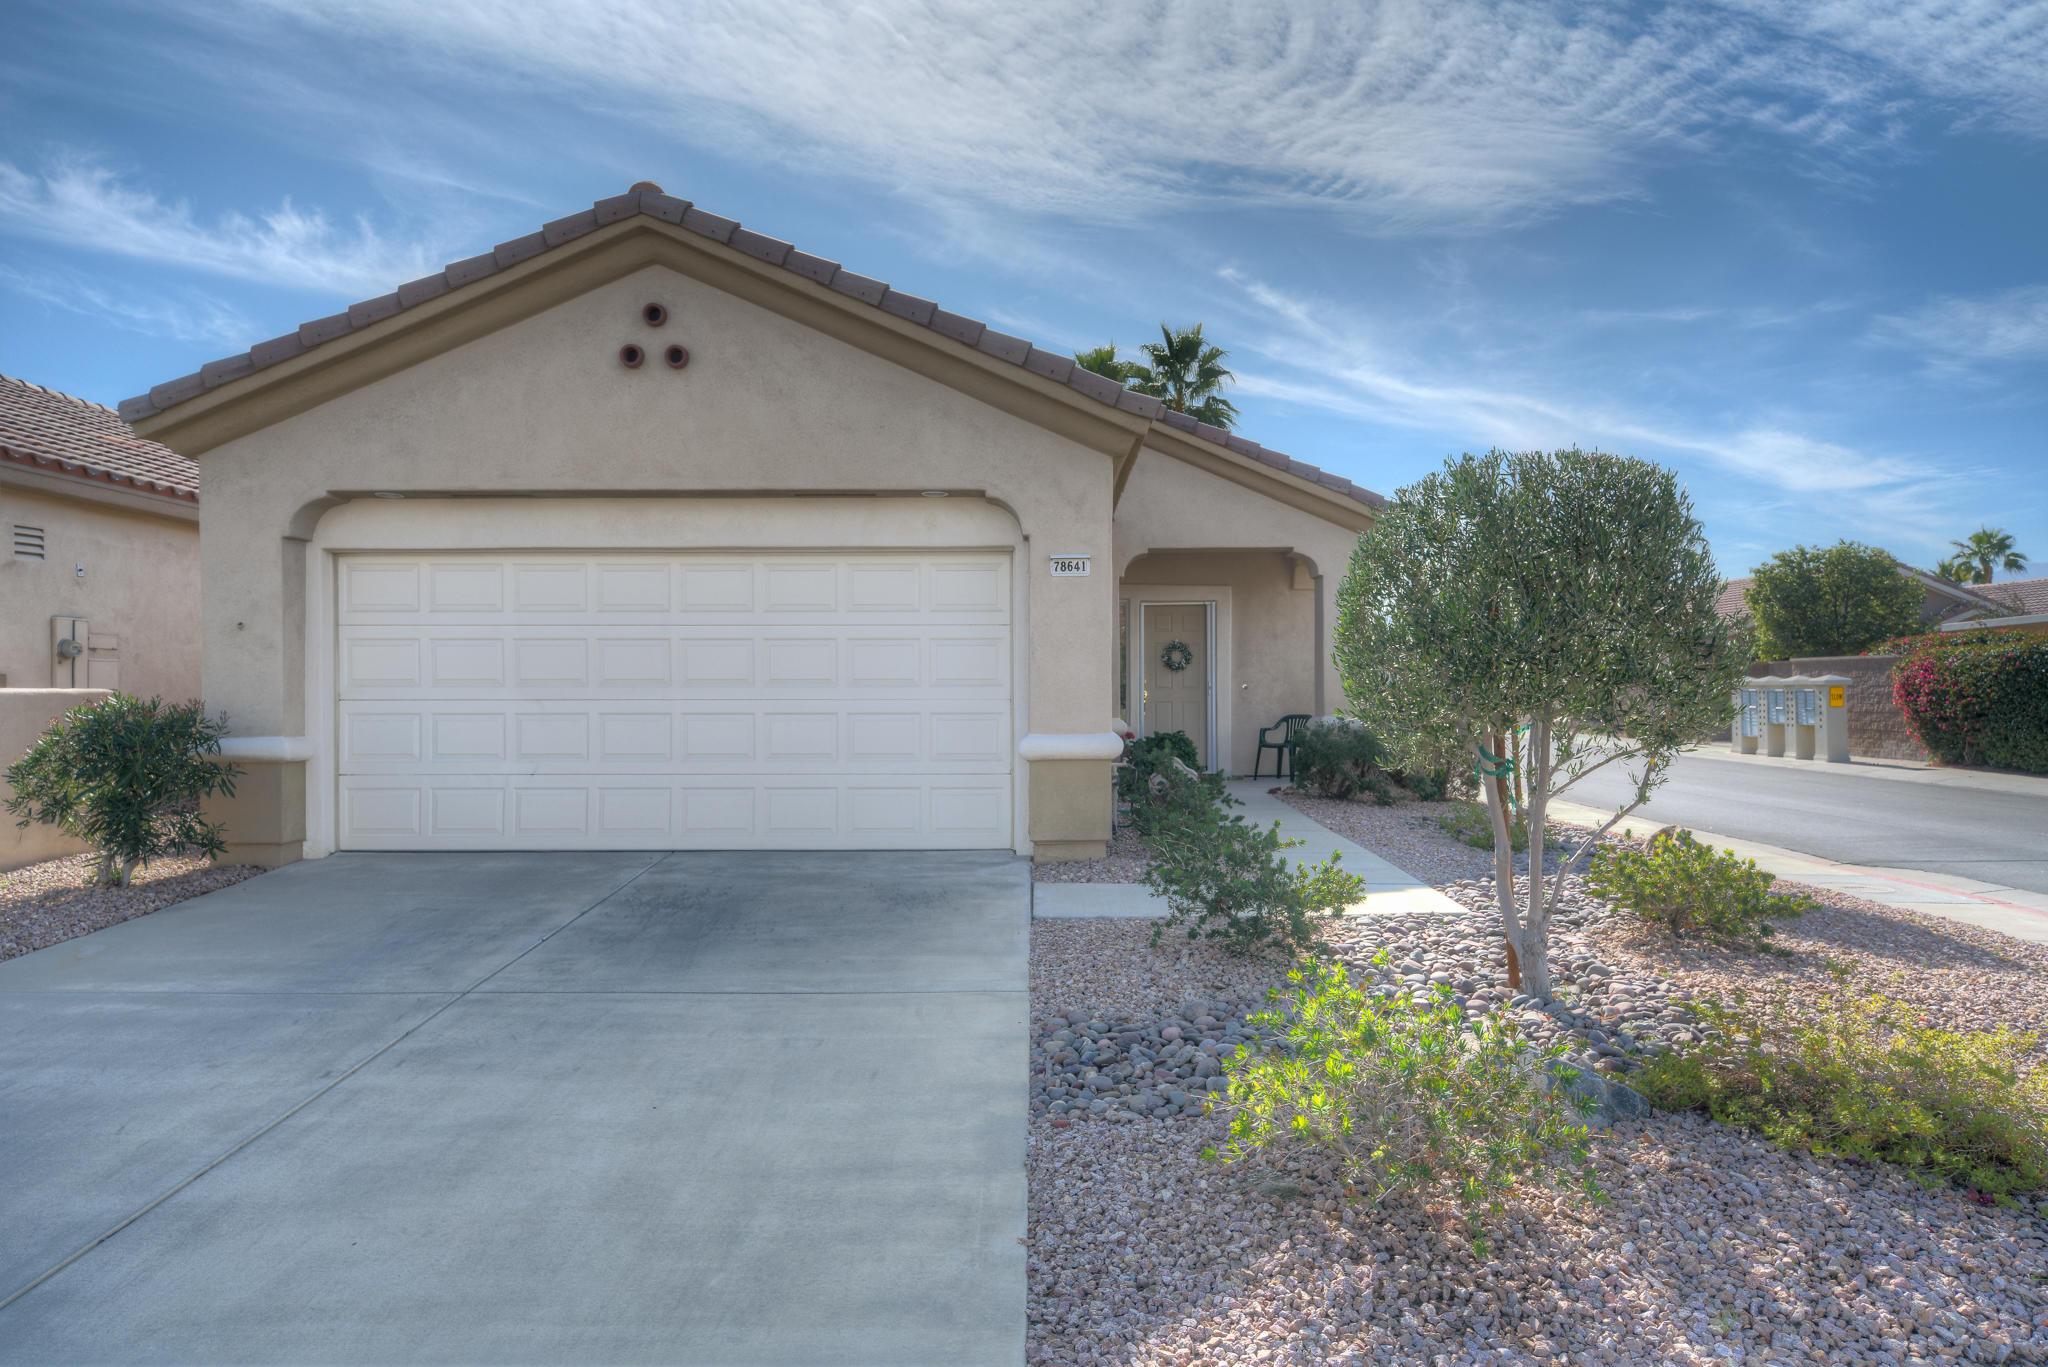 Photo of 78641 Hampshire Avenue, Palm Desert, CA 92211